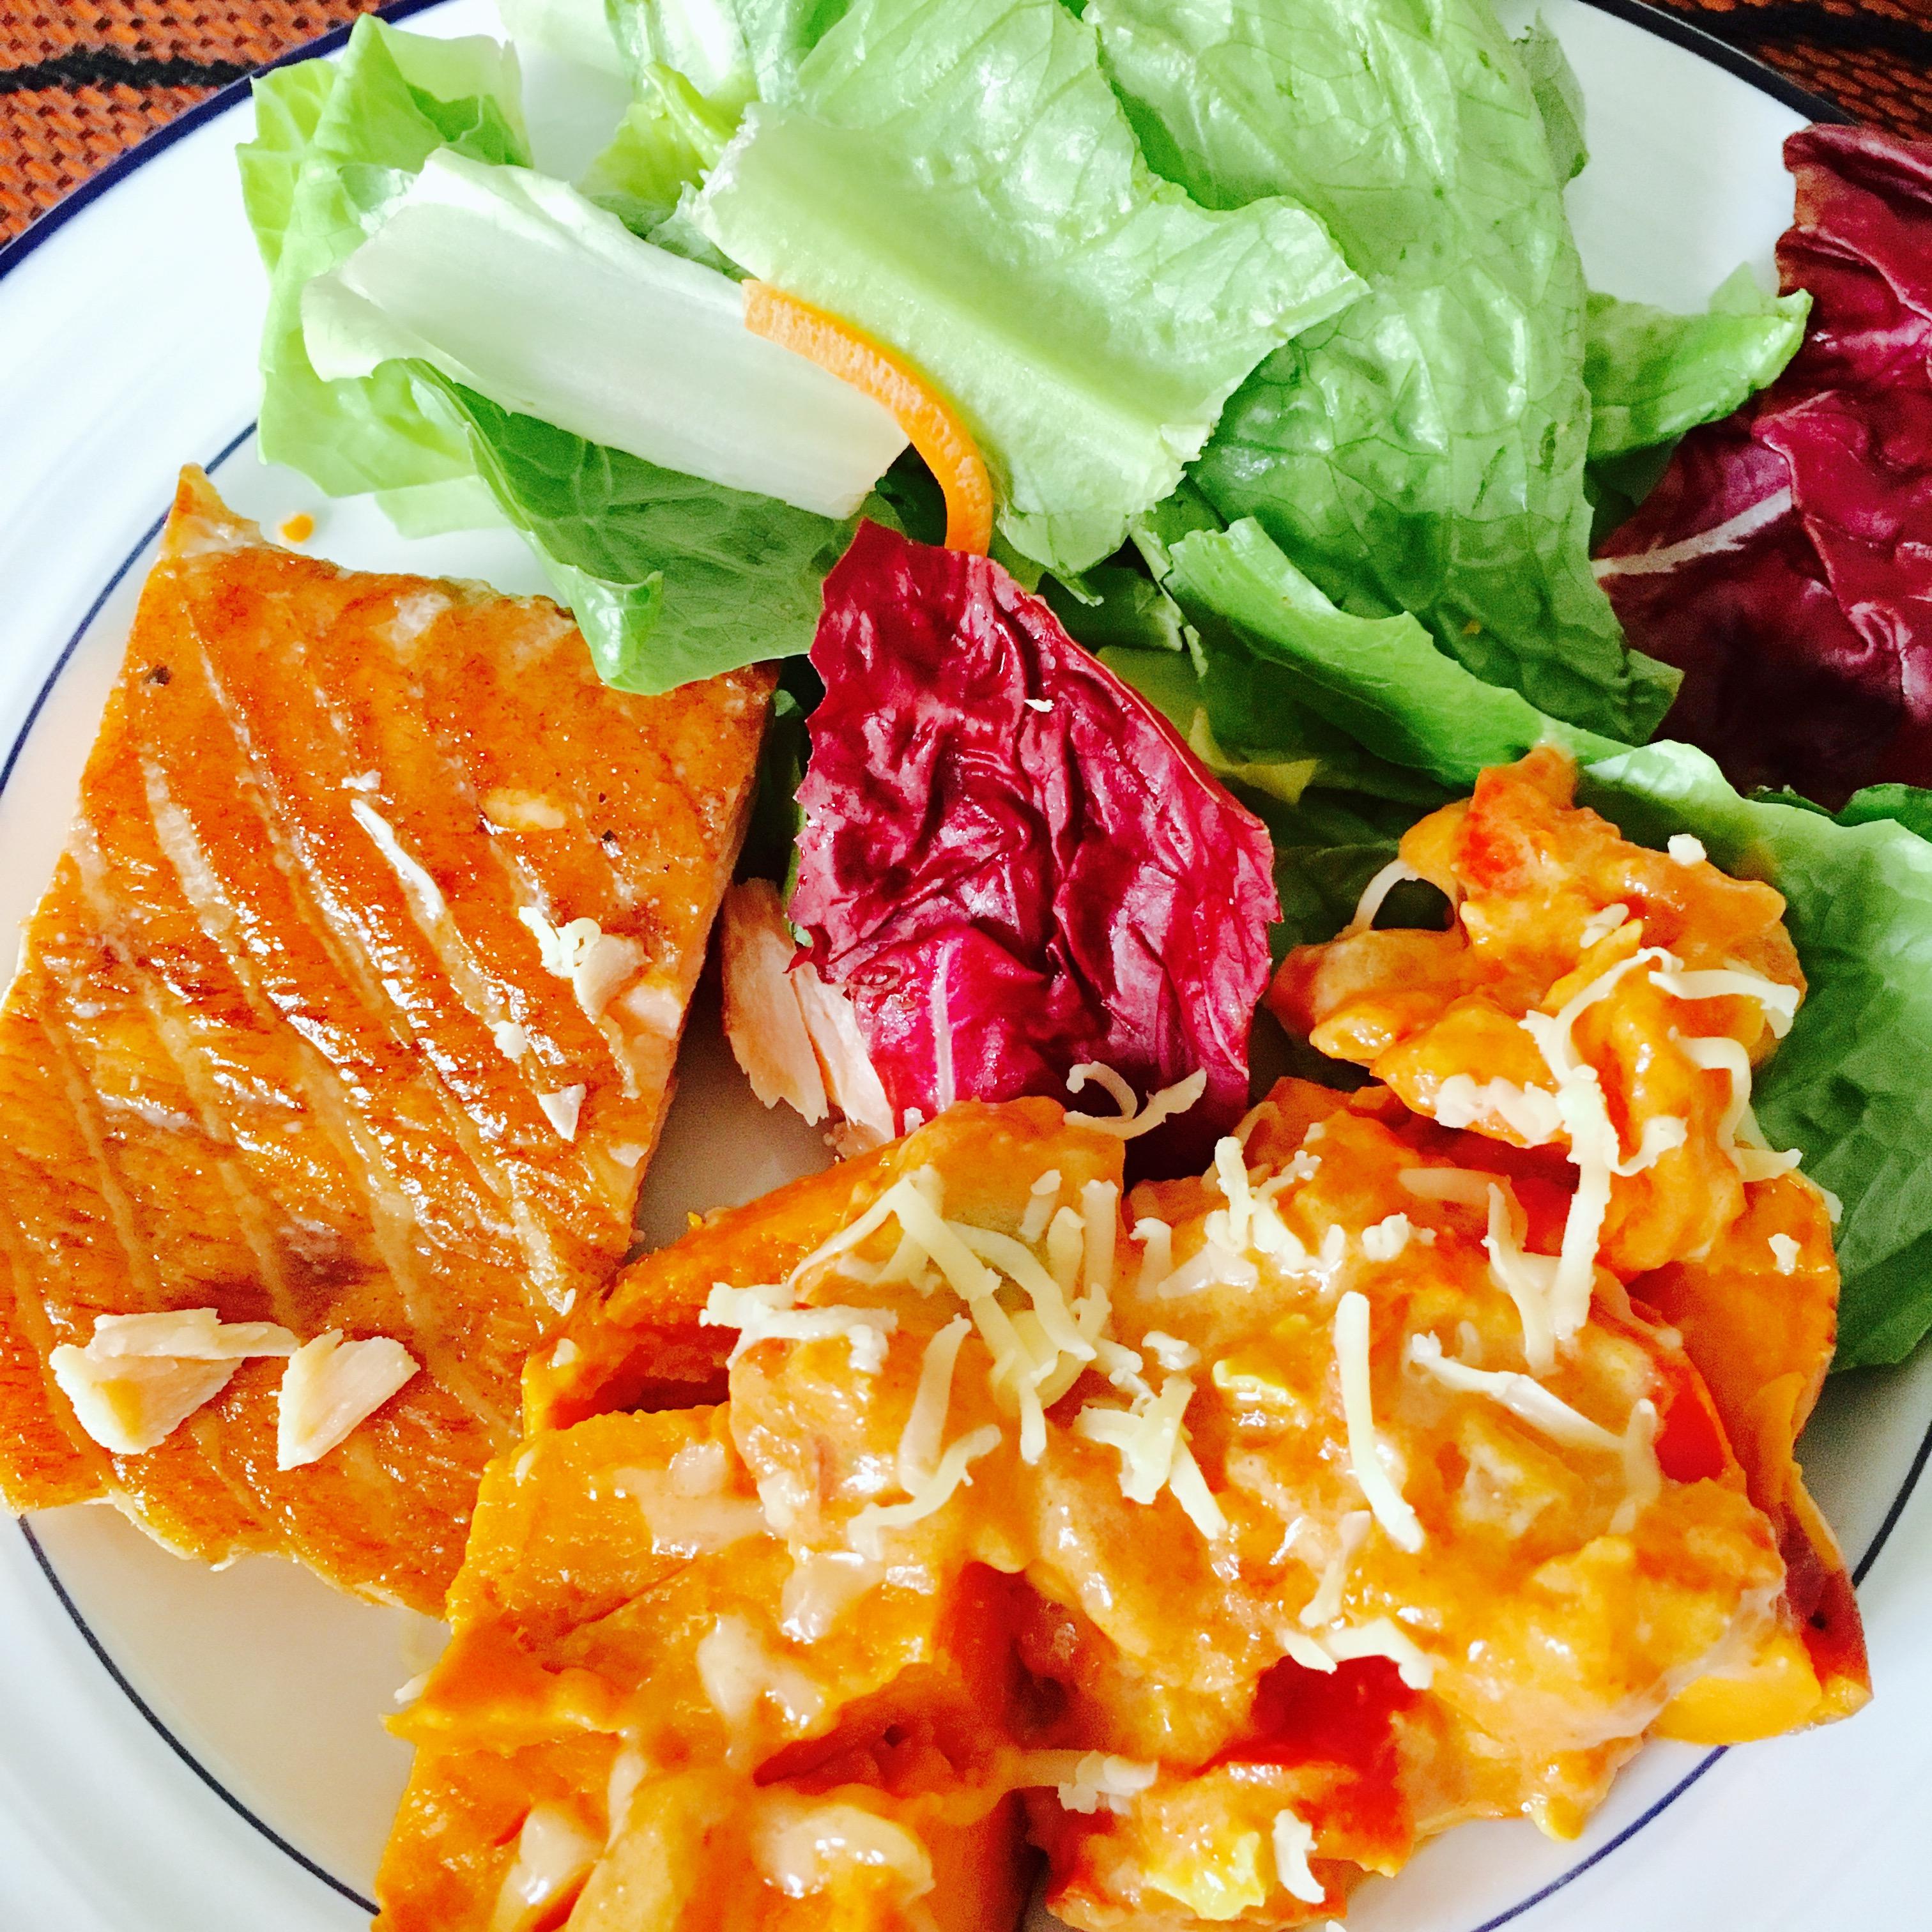 Salmon and sweet potato